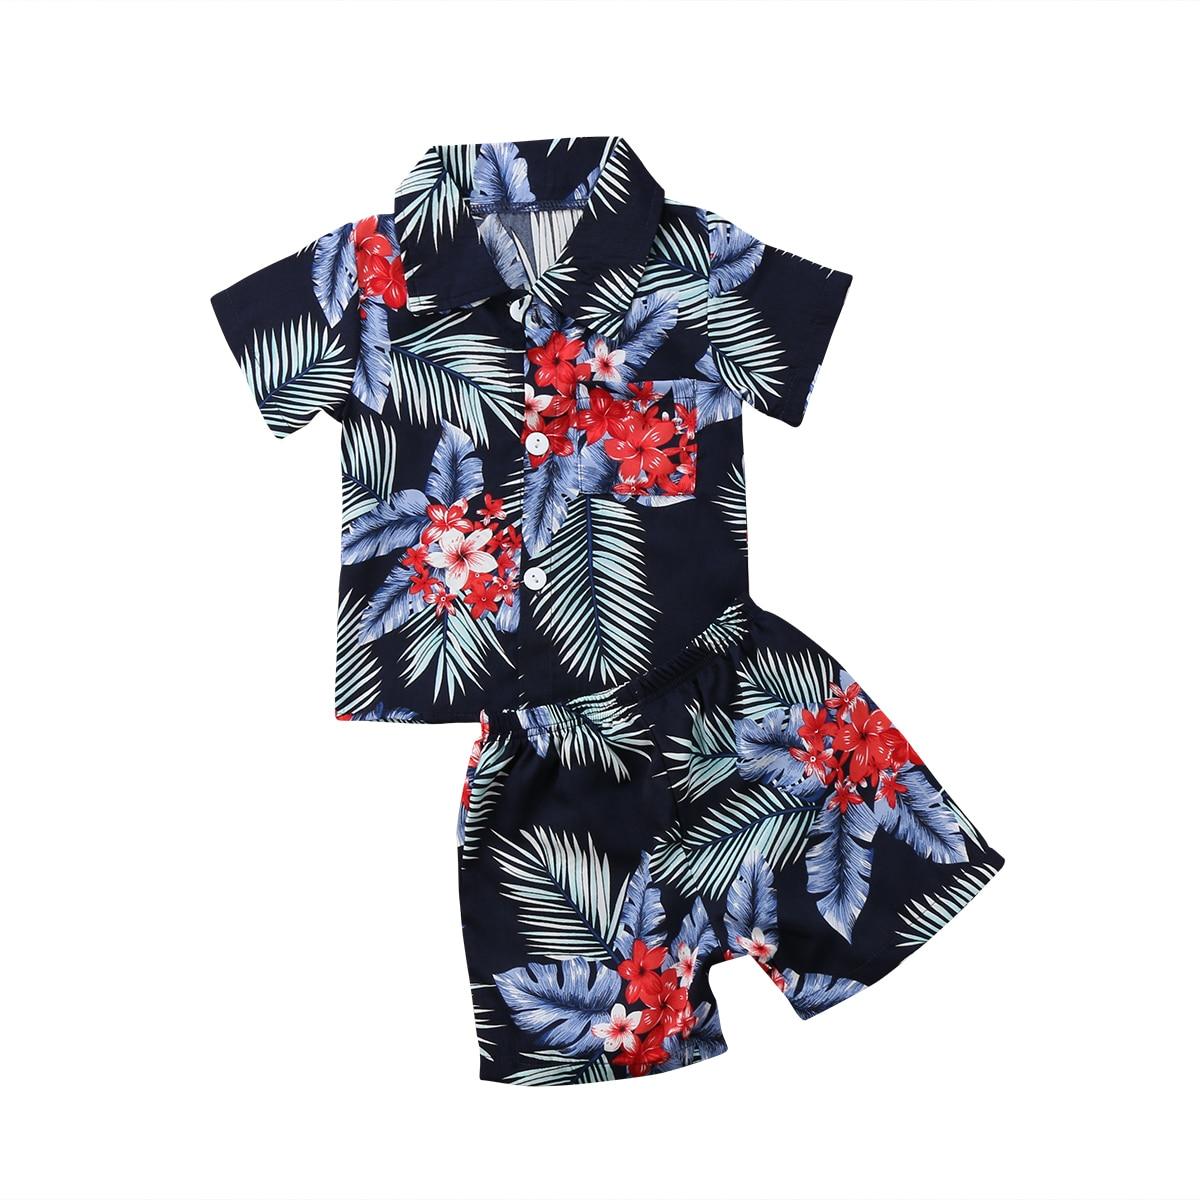 2018 Casual Newborn Toddler Kids Baby Boy Beach Clothes Short Sleeve T Shirt Tee Tops+Pants Floral 2PCS Outfits Set